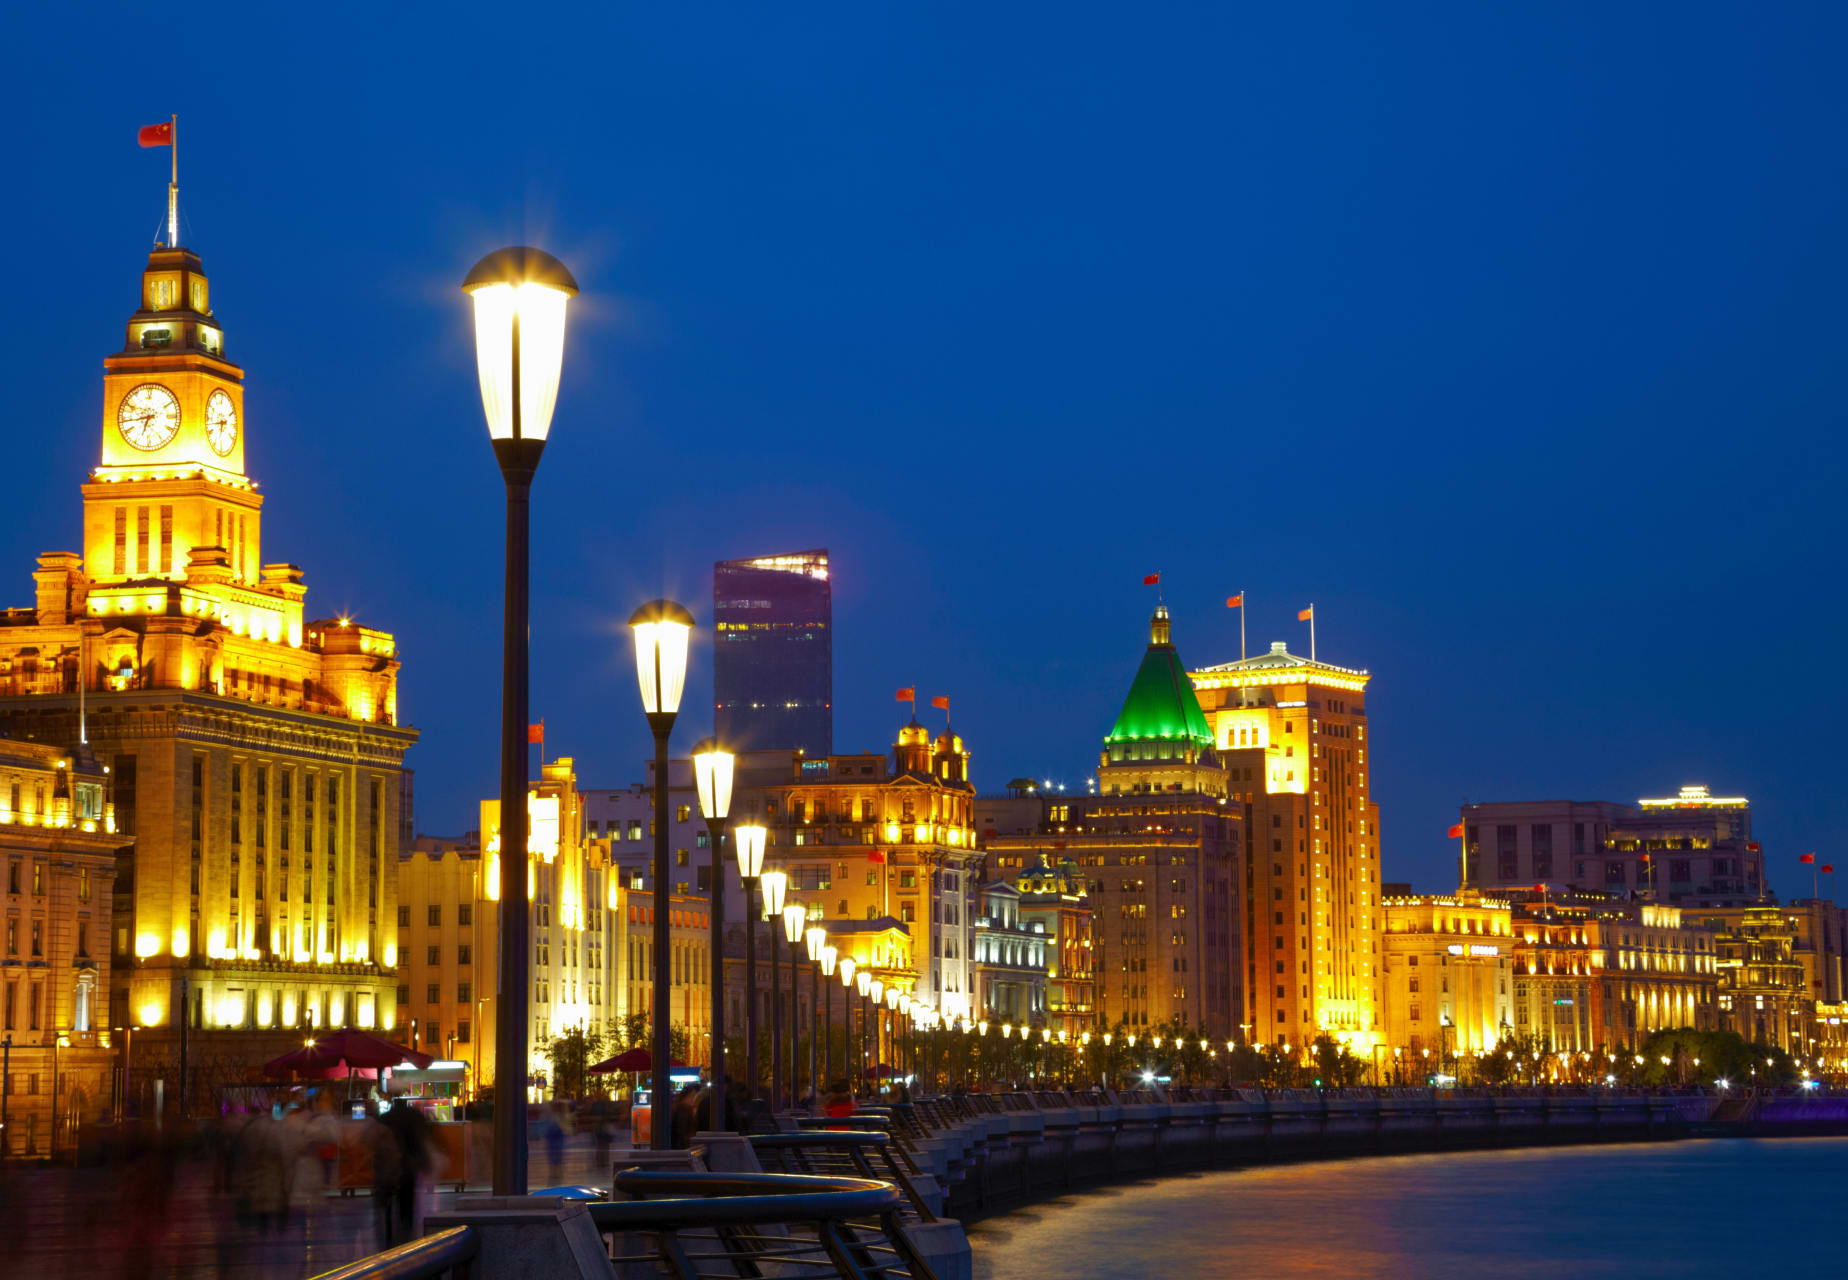 Shanghai - The Bund by Night: A Walk Along Huangpu River Promenade